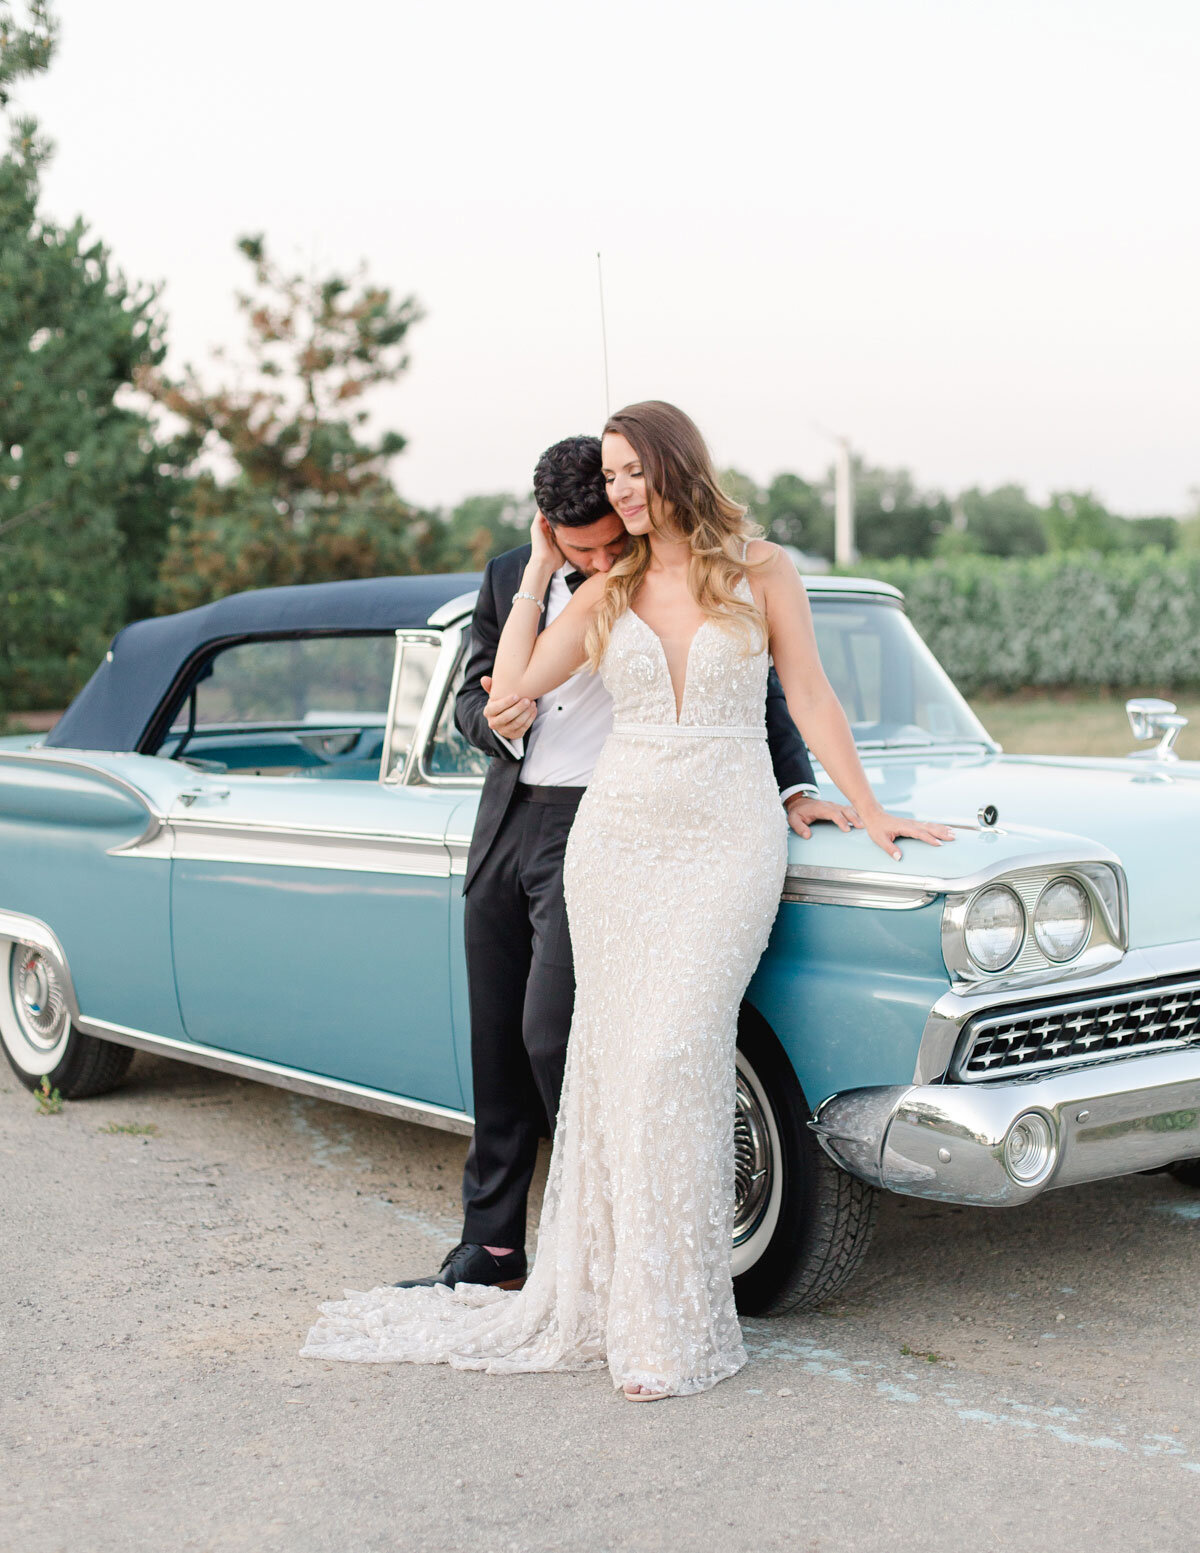 Chateau-des-Charmes-Wedding-Summer-Vineyard-Bride-Niagara-on-the-Lake-photos-by-Gemini-Photography-Ontario-0078.jpg